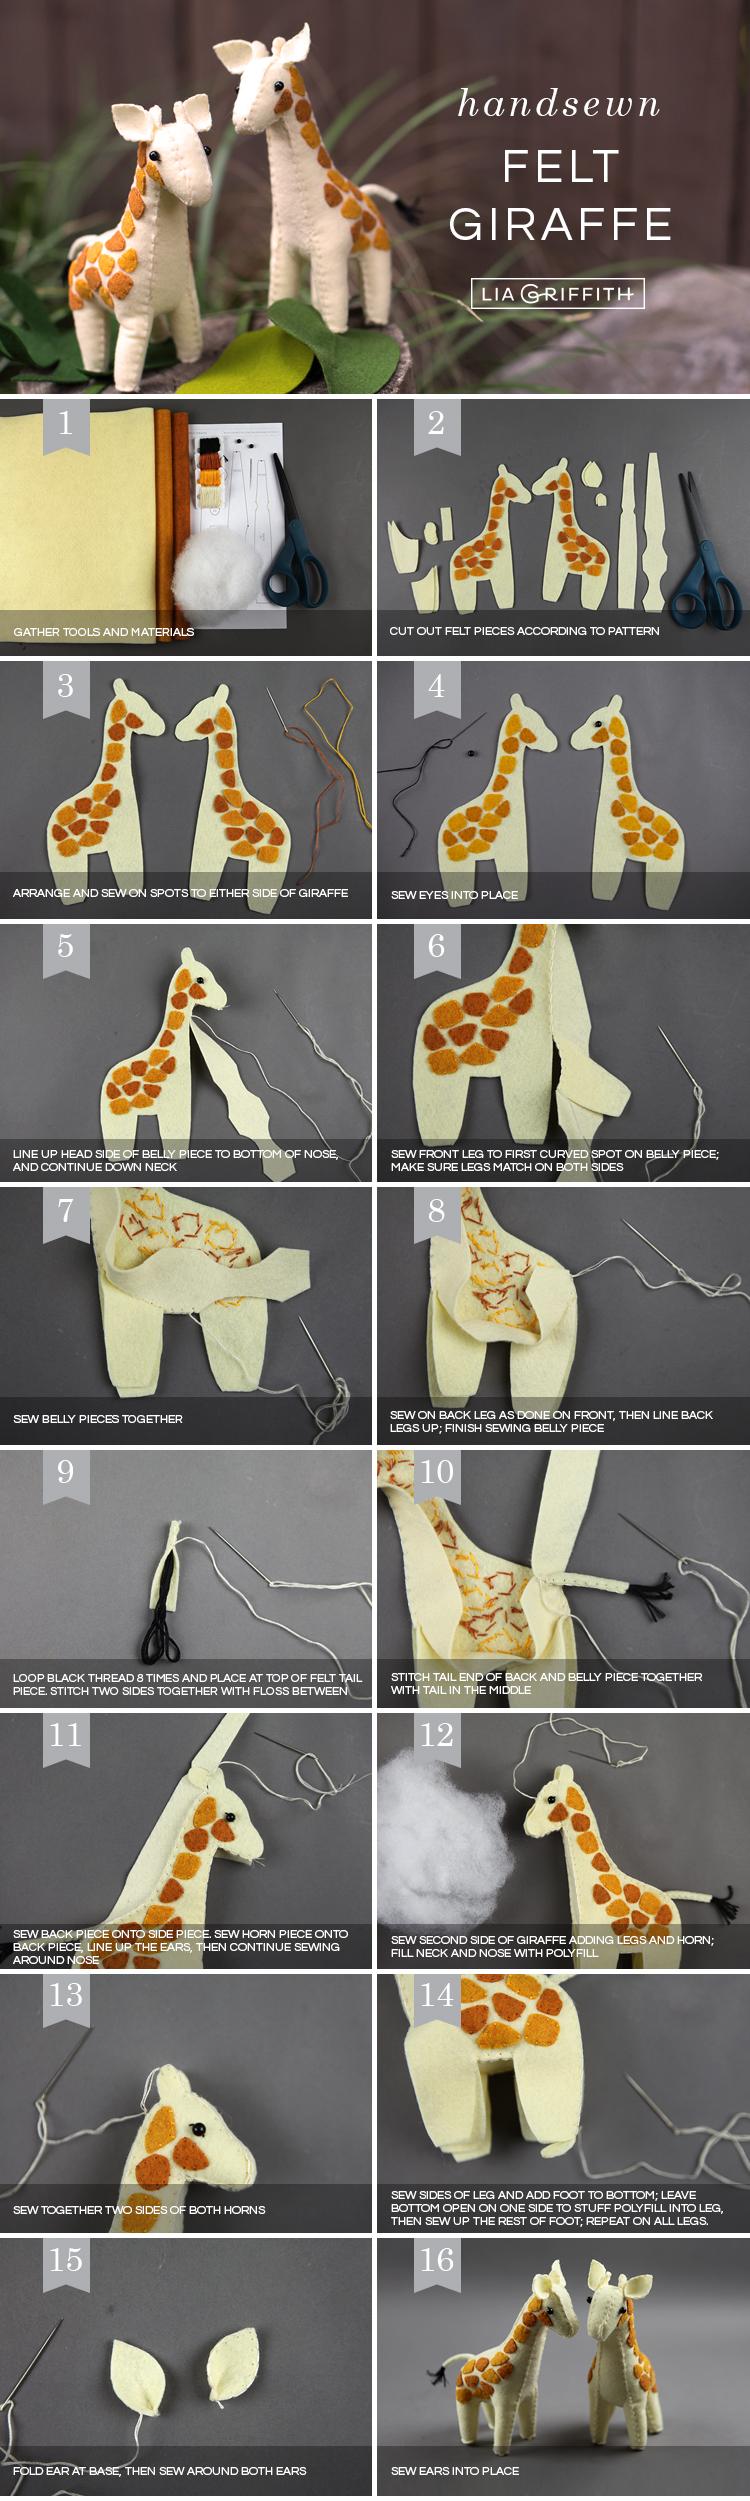 Photo tutorial for making handsewn felt giraffes